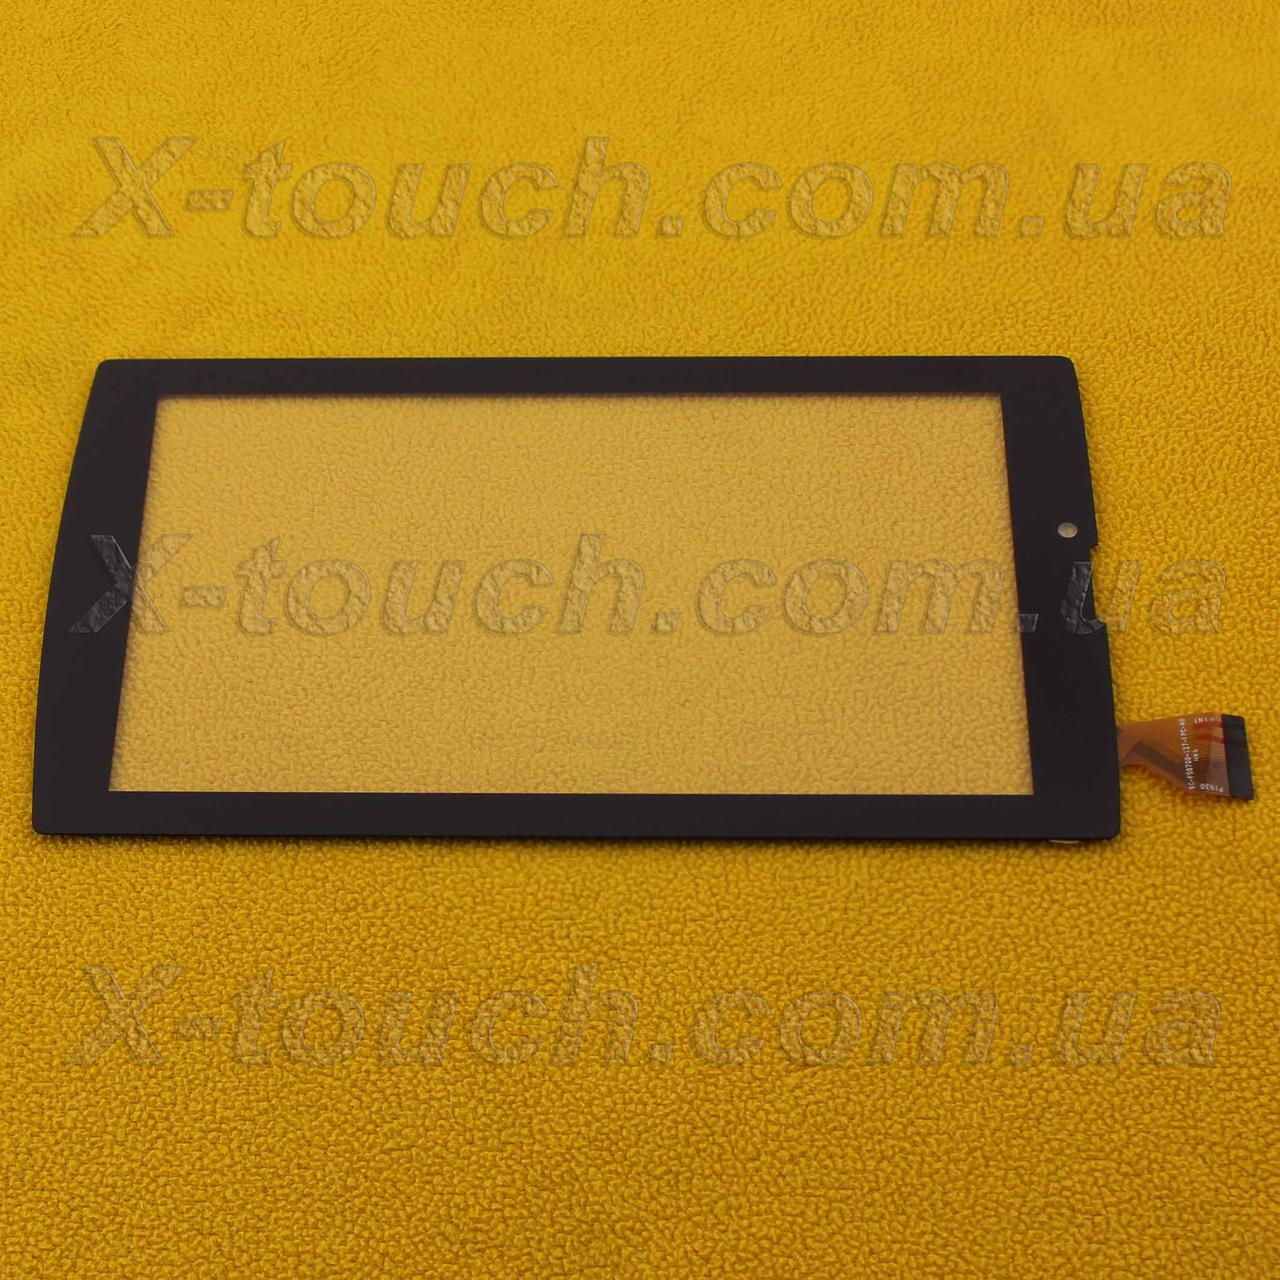 Cенсор, тачскрин XC-PG0700-127-FPC-A0 для планшета.